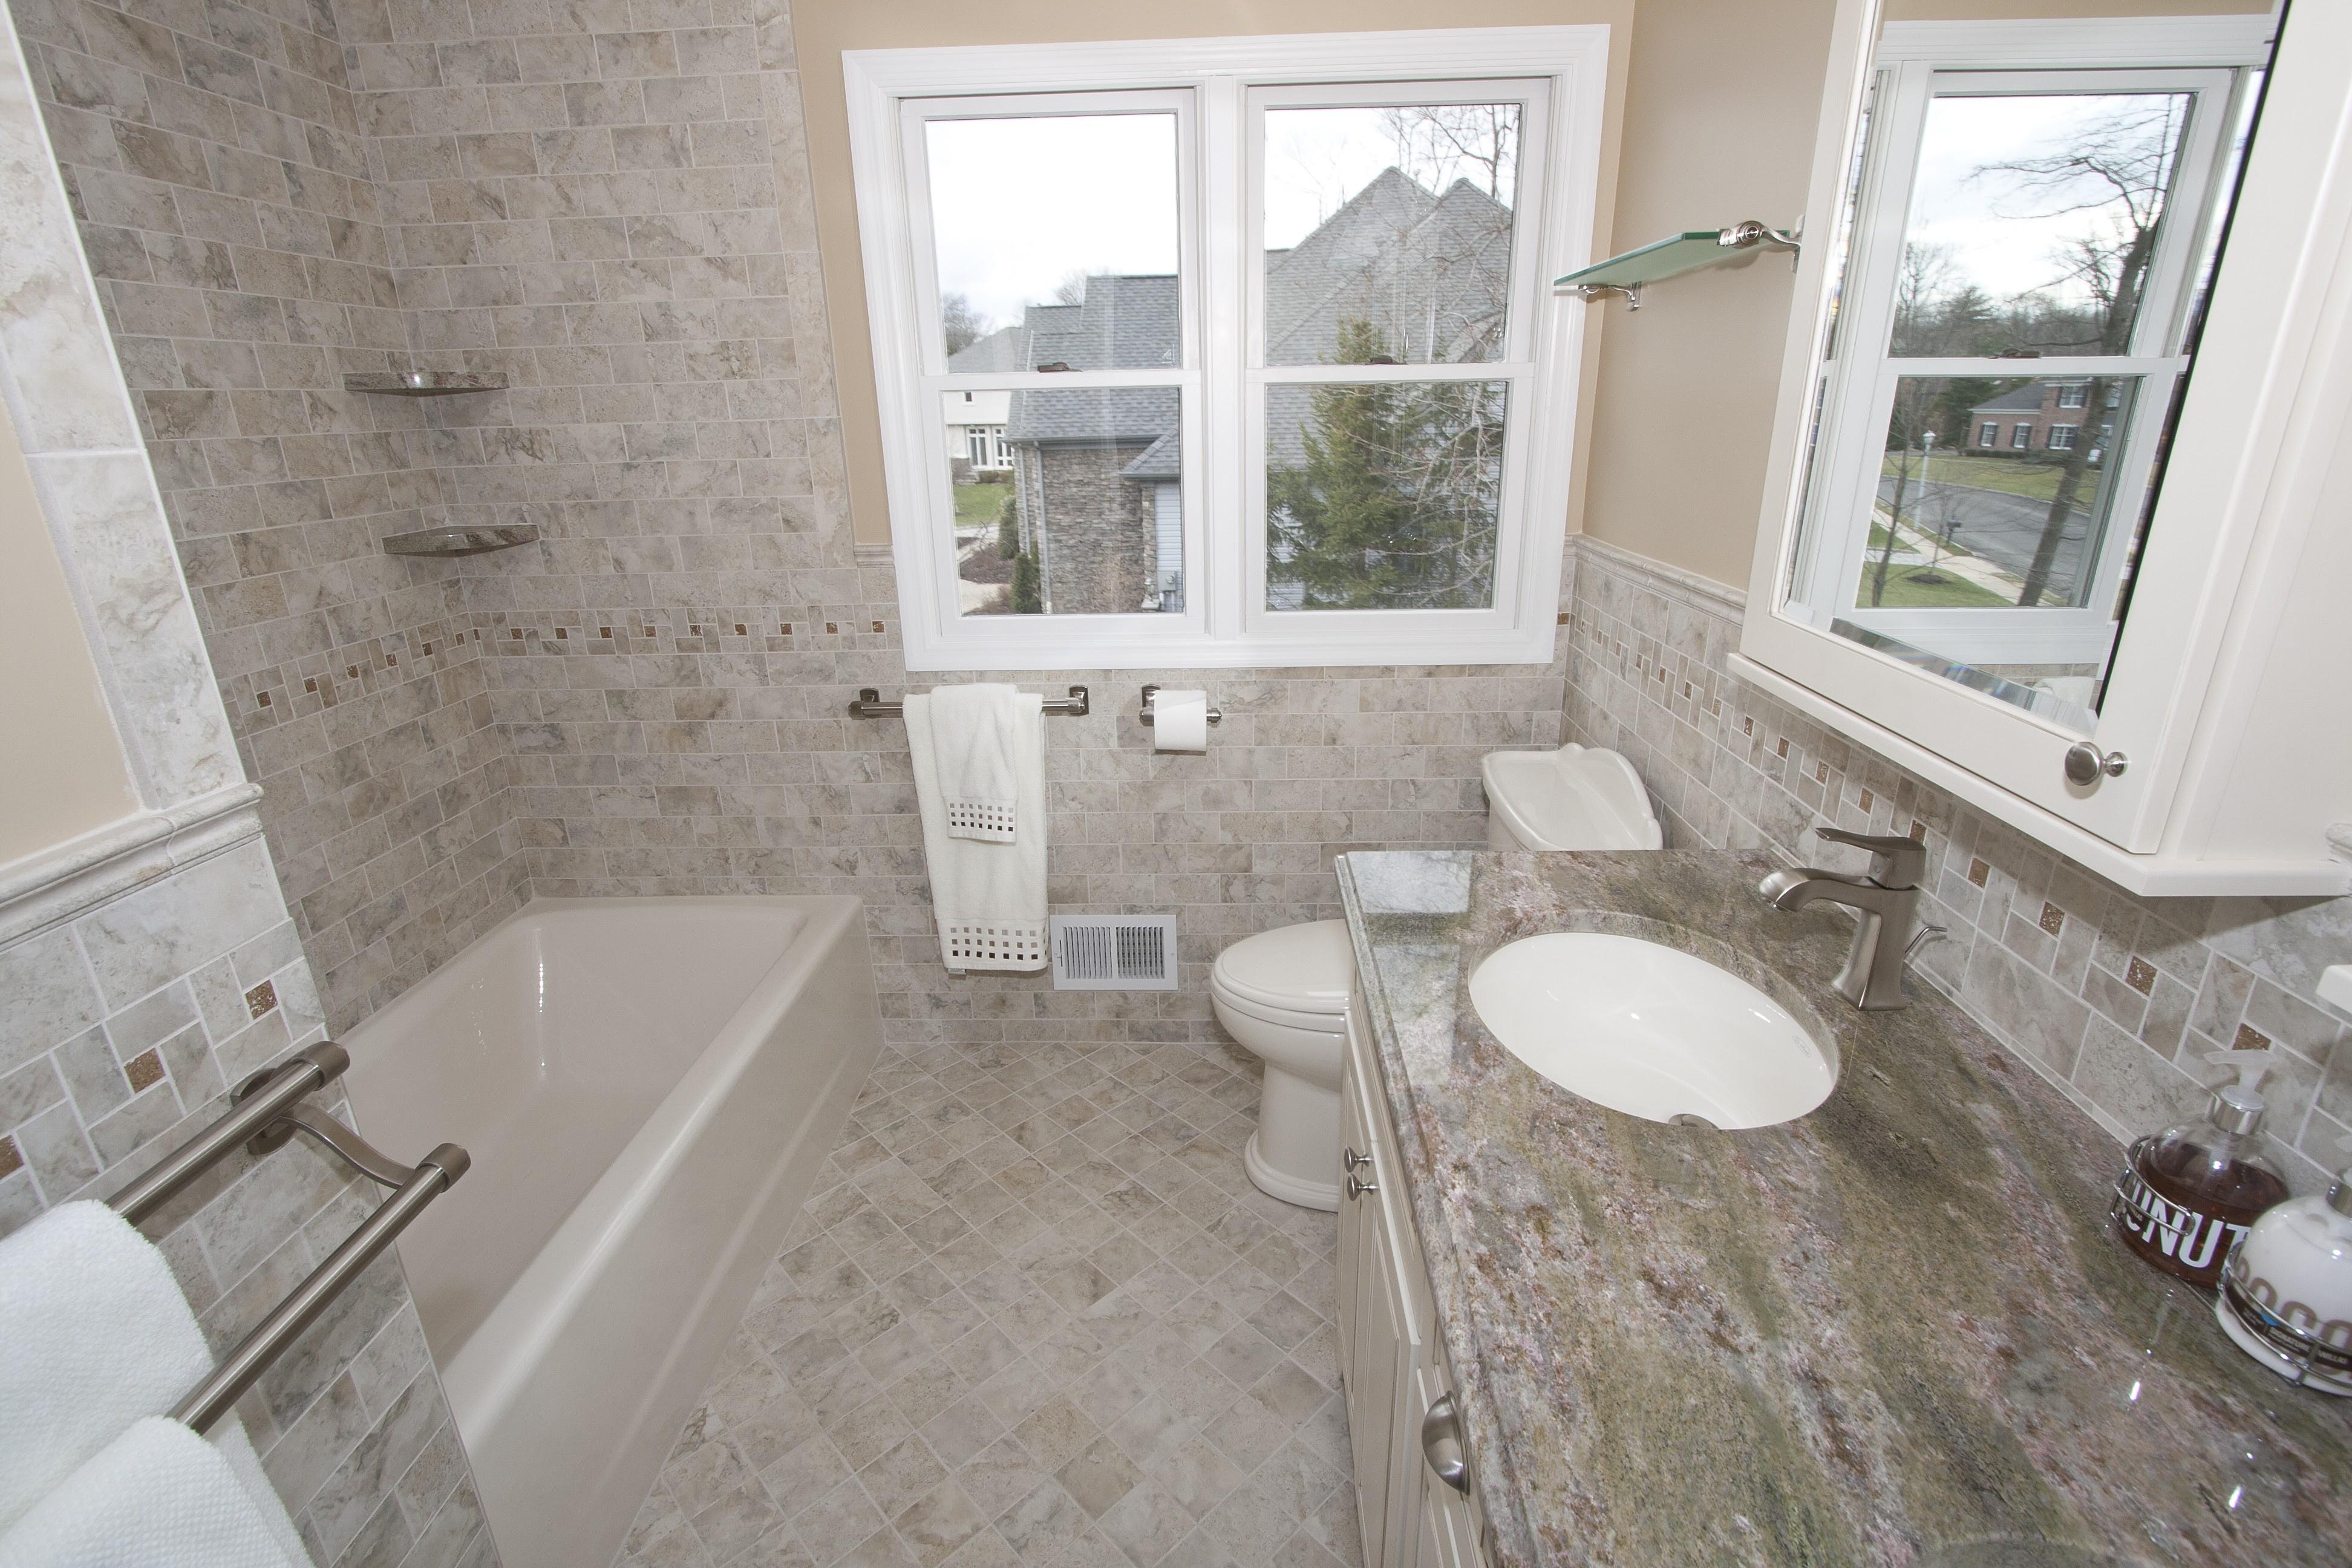 Monmouth County NJ Master Bathroom Remodel Estimates